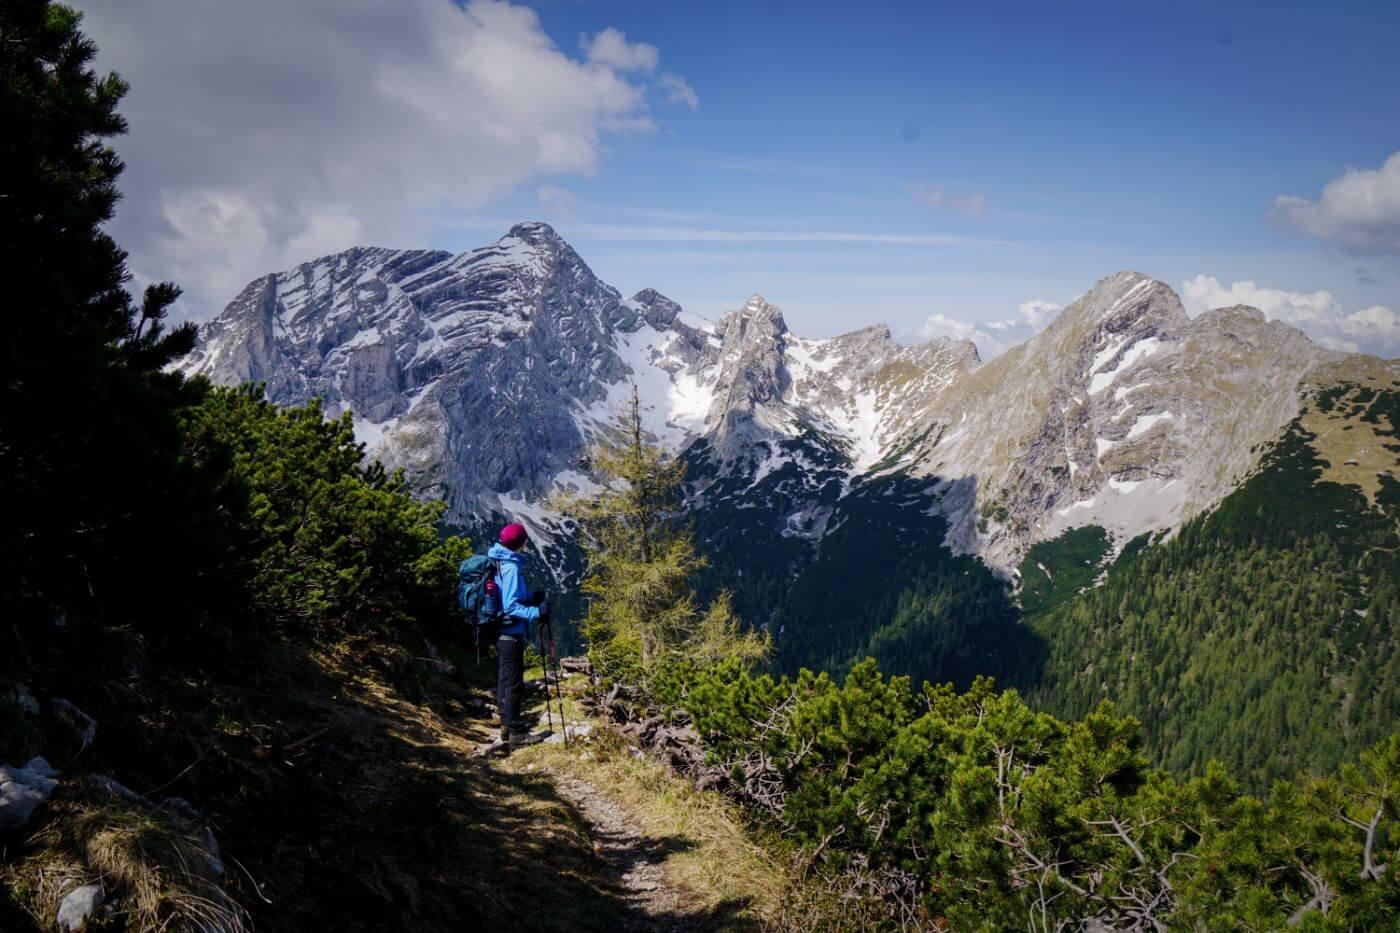 Panoramaweg, Gesäuse National Park, Austria